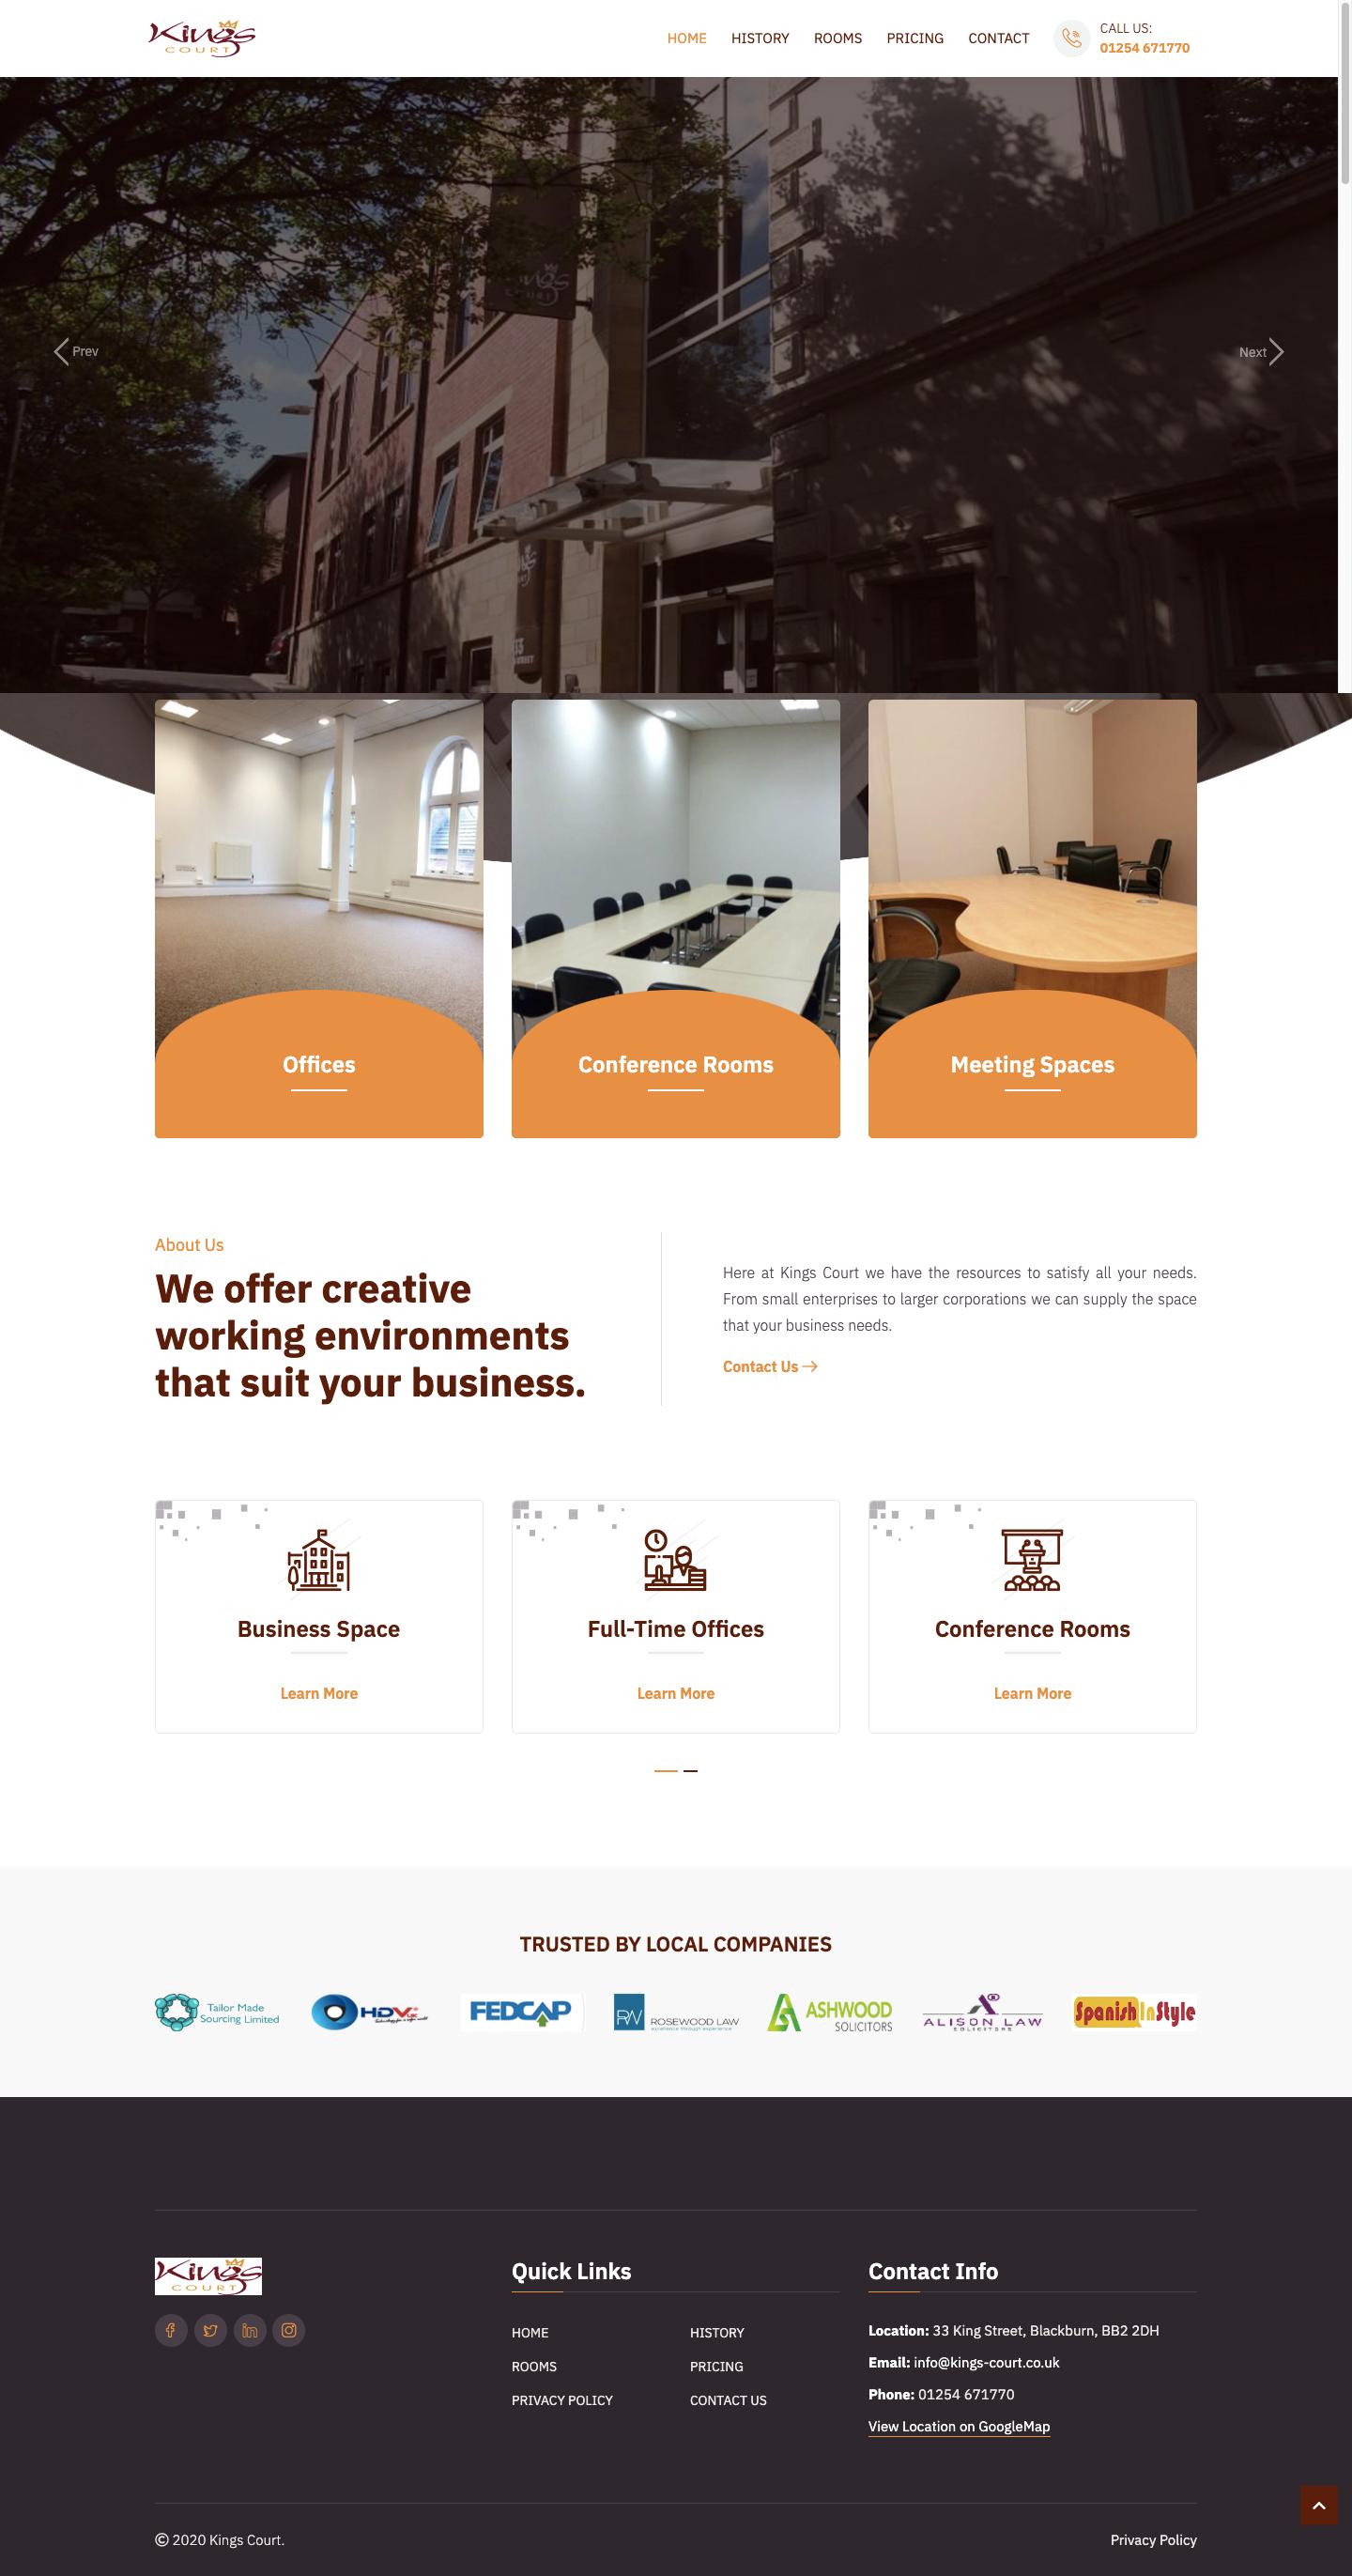 web design services . Freelance web designer